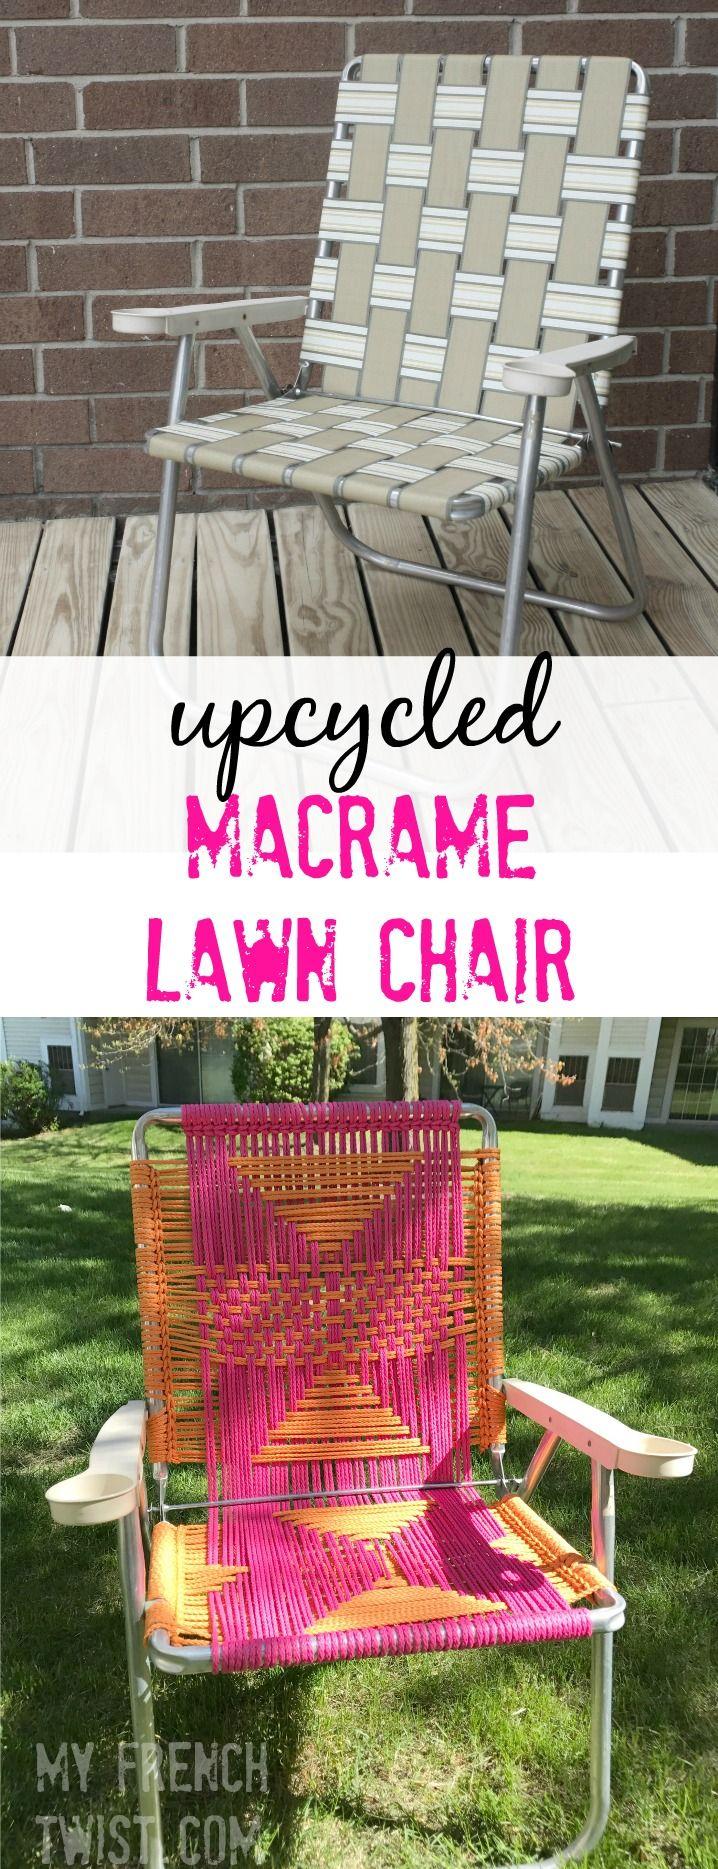 Upcycled macrame lawn chair! Sooo cute!